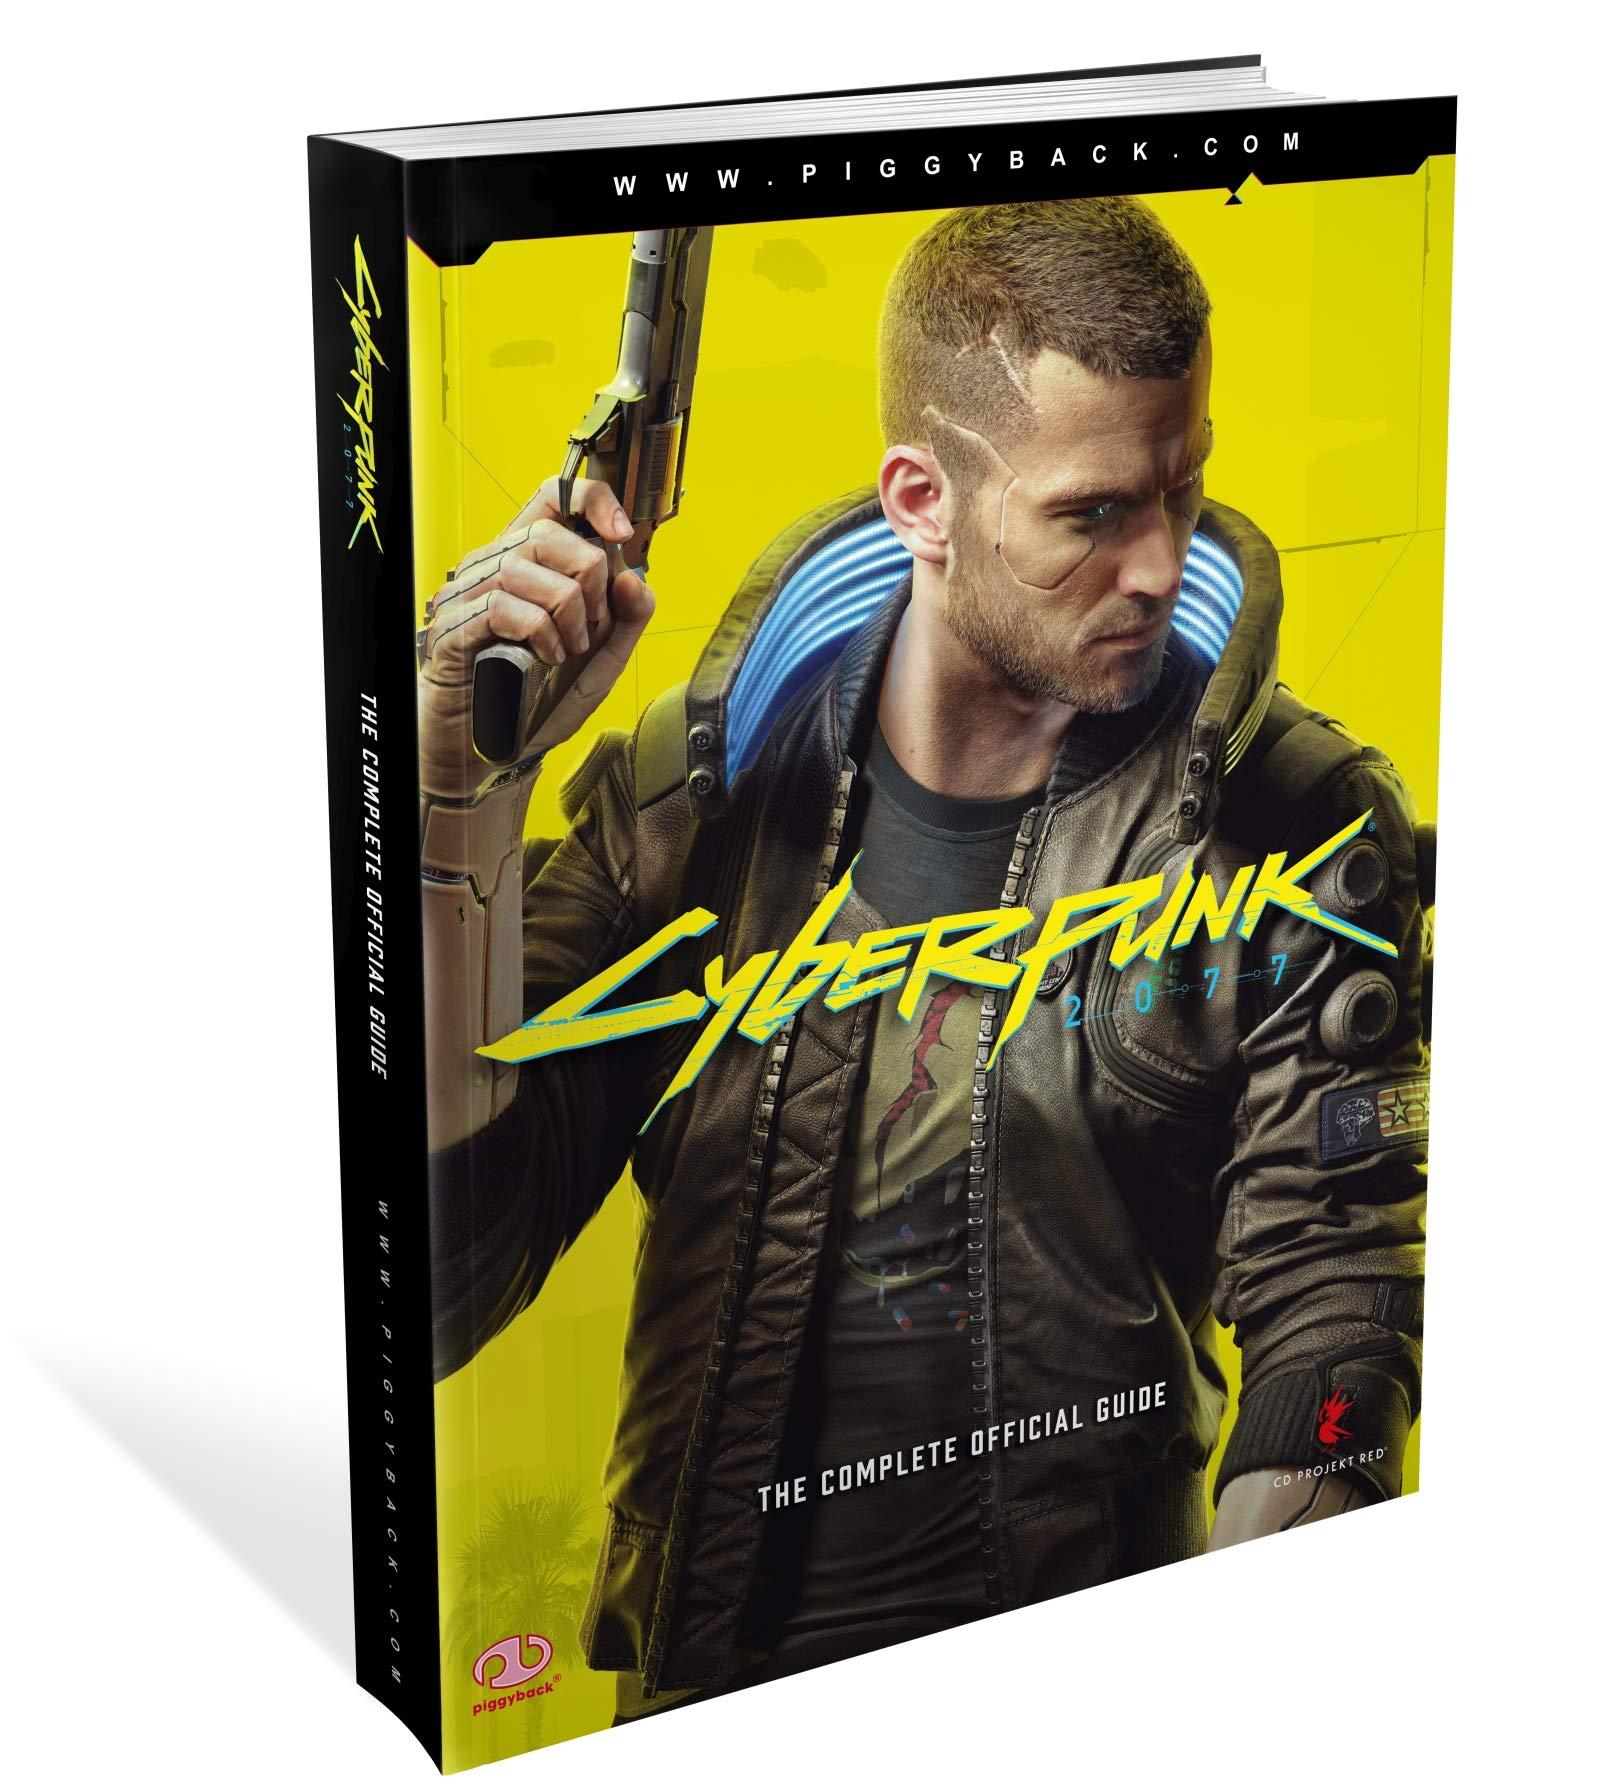 #Libro The Cyberpunk 2077: Complete Official Guide por 16,49€